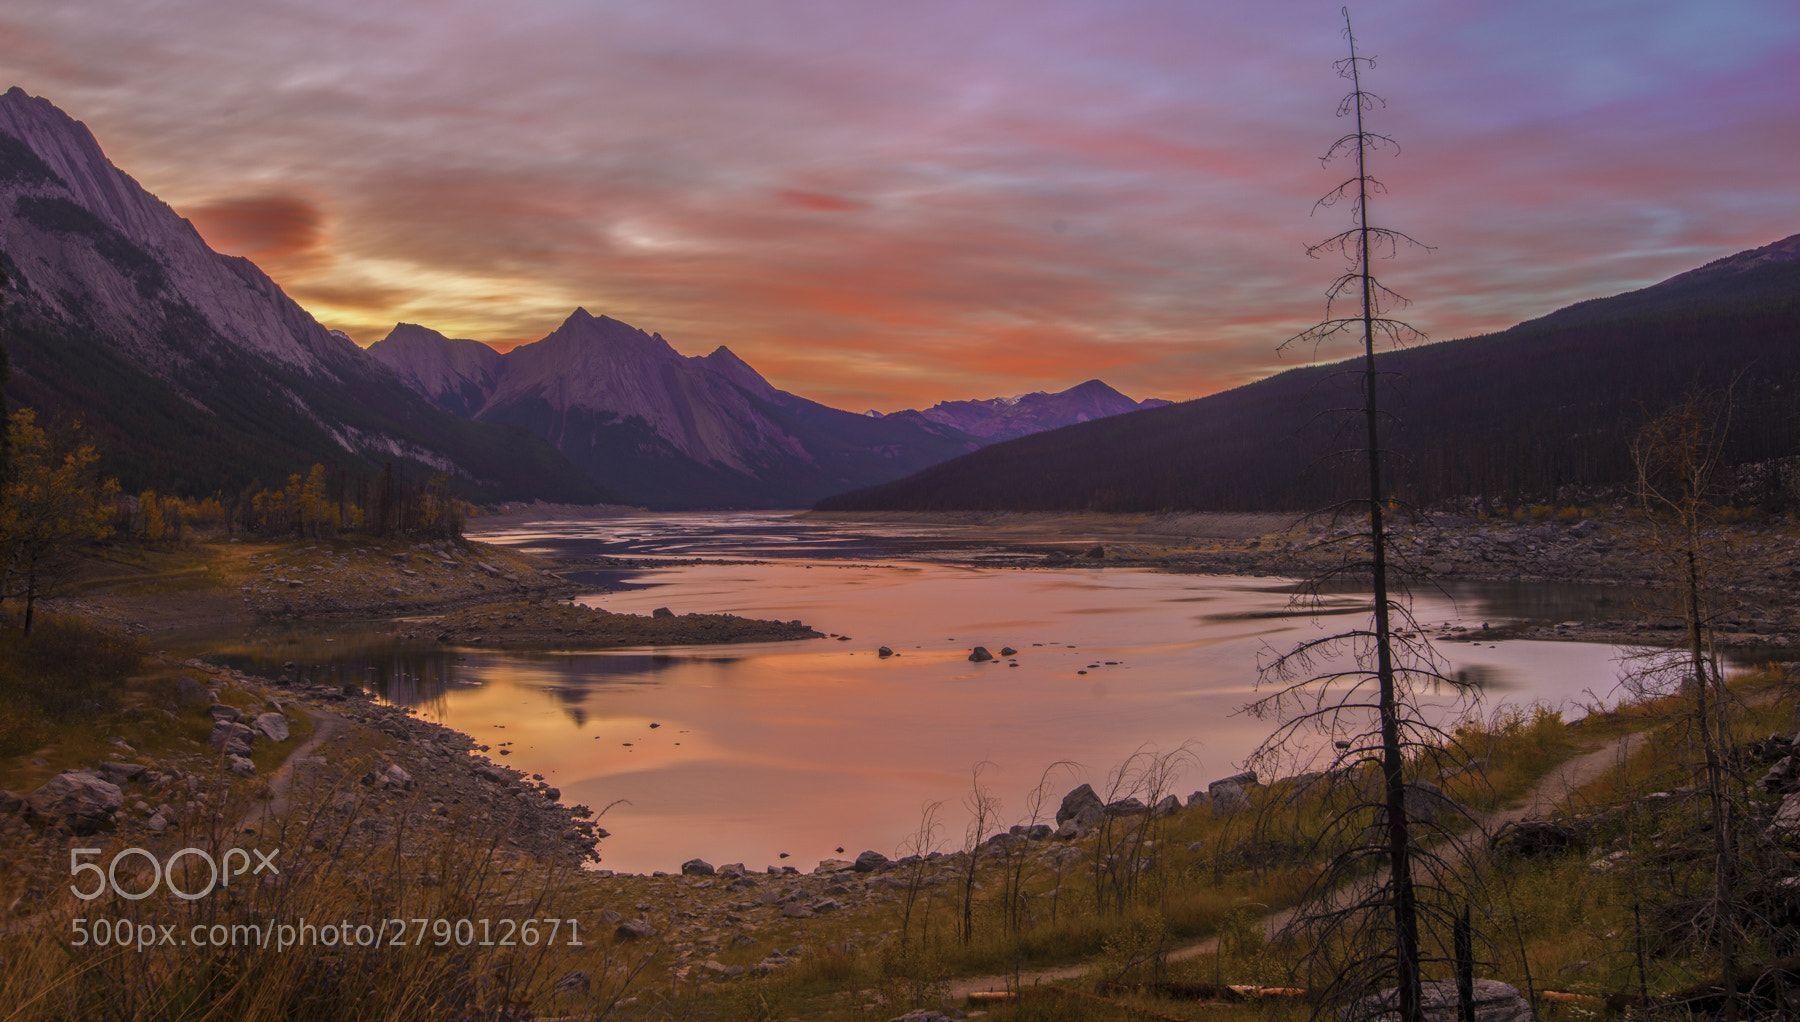 Rocky Mountain Sunrise Rocky Mountain Sunrise Near Jasper In The Canadian Rocky Mountains With Images Sunrise Lake Medicine Lake Maligne Lake